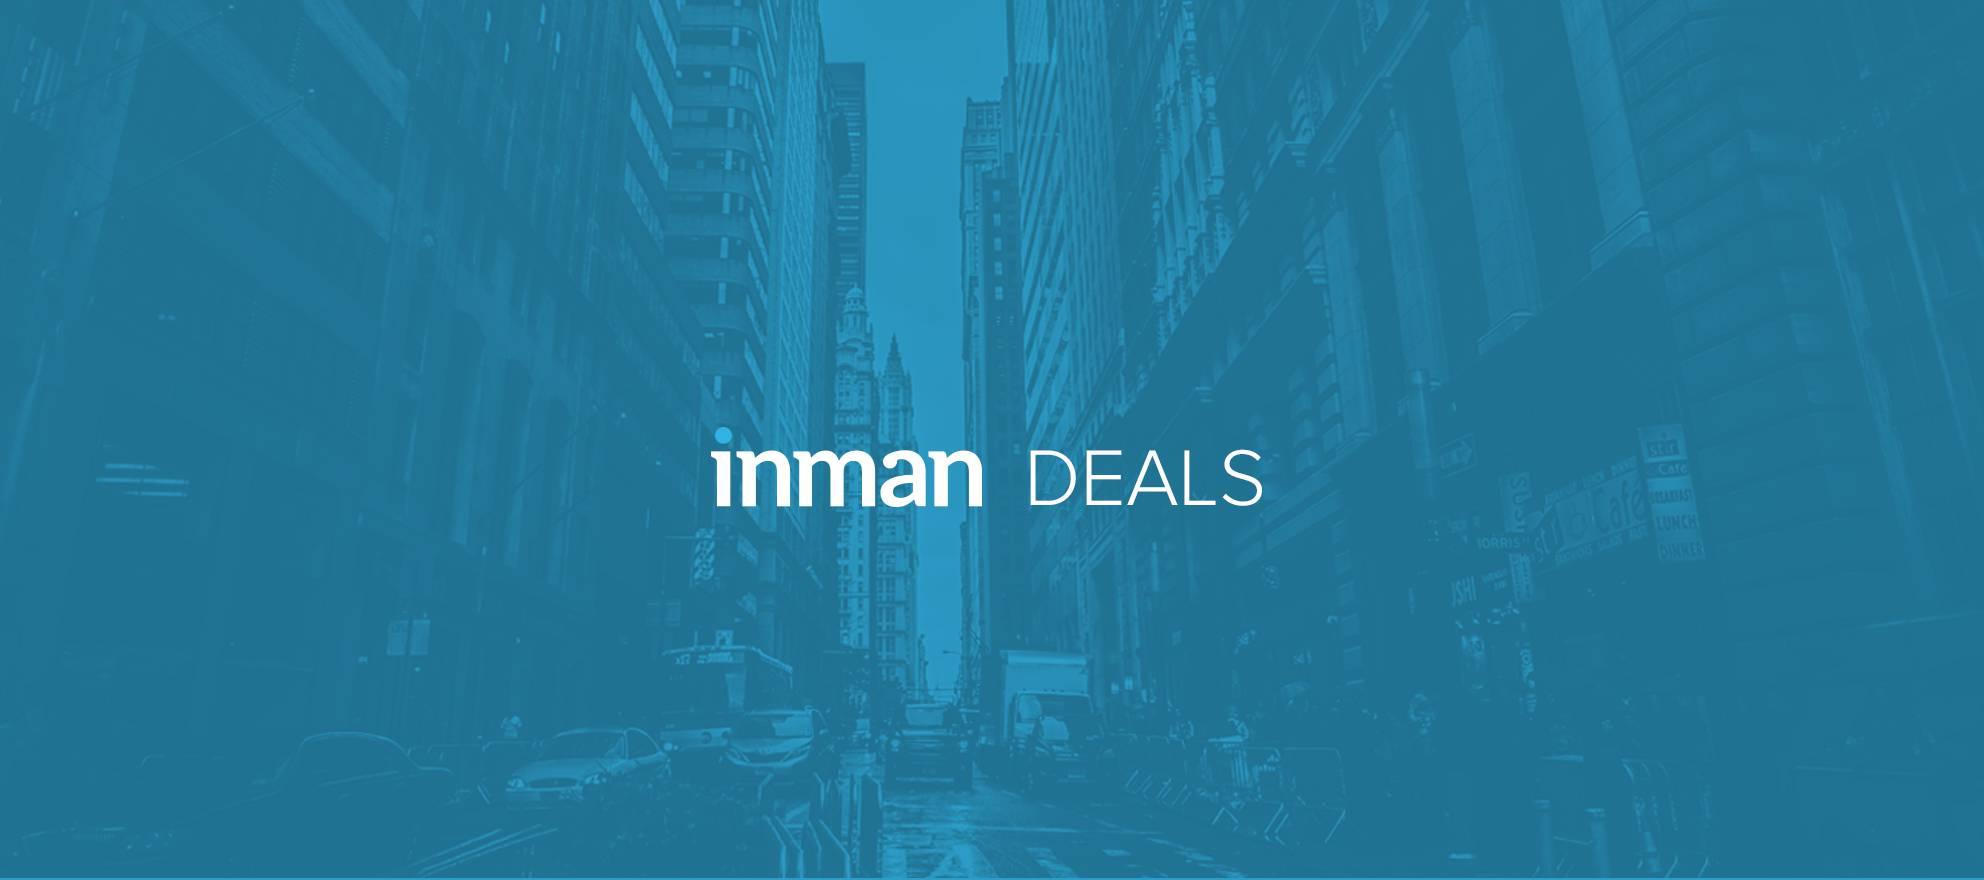 Inman Deals